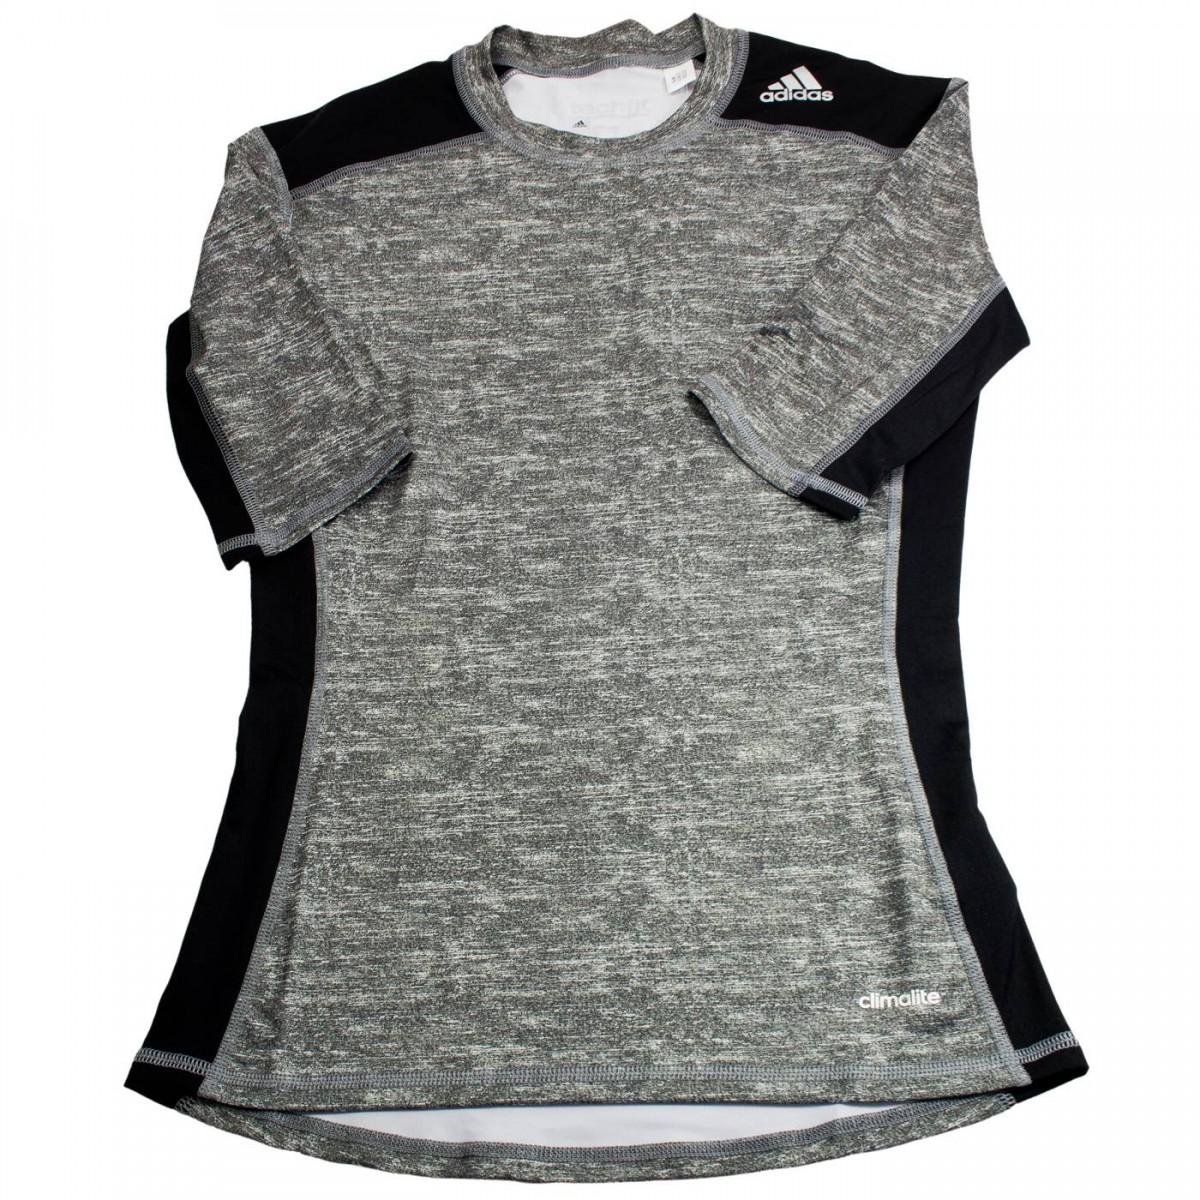 Bizz Store - Camiseta de Compressão Masculina Adidas Techfit Base af5eb07862352